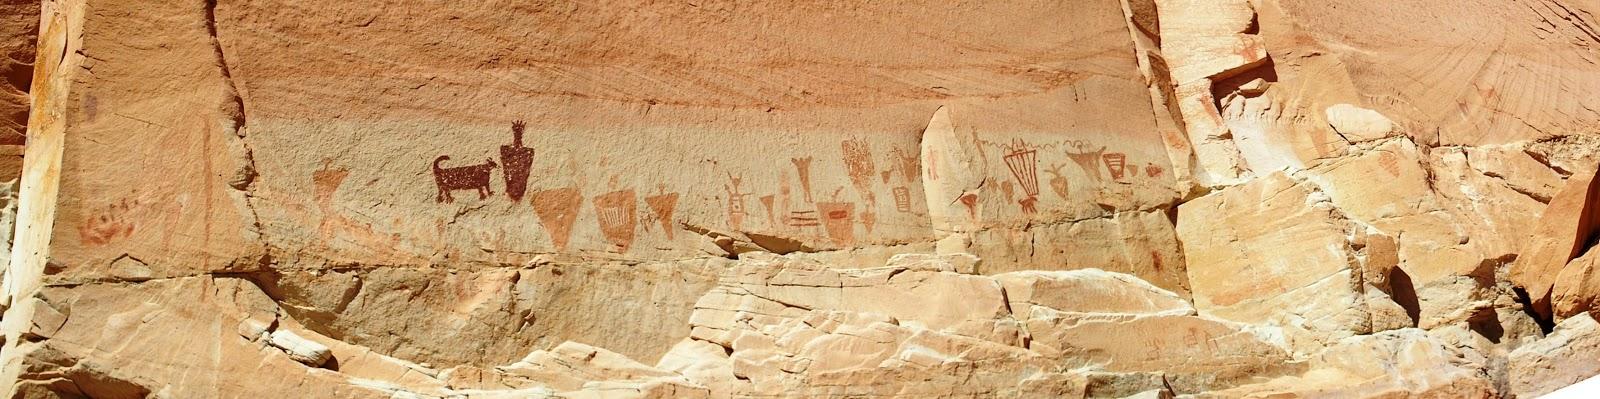 Utah Pictographs, Petroglyphs and Rock Art: Horseshoe Canyon